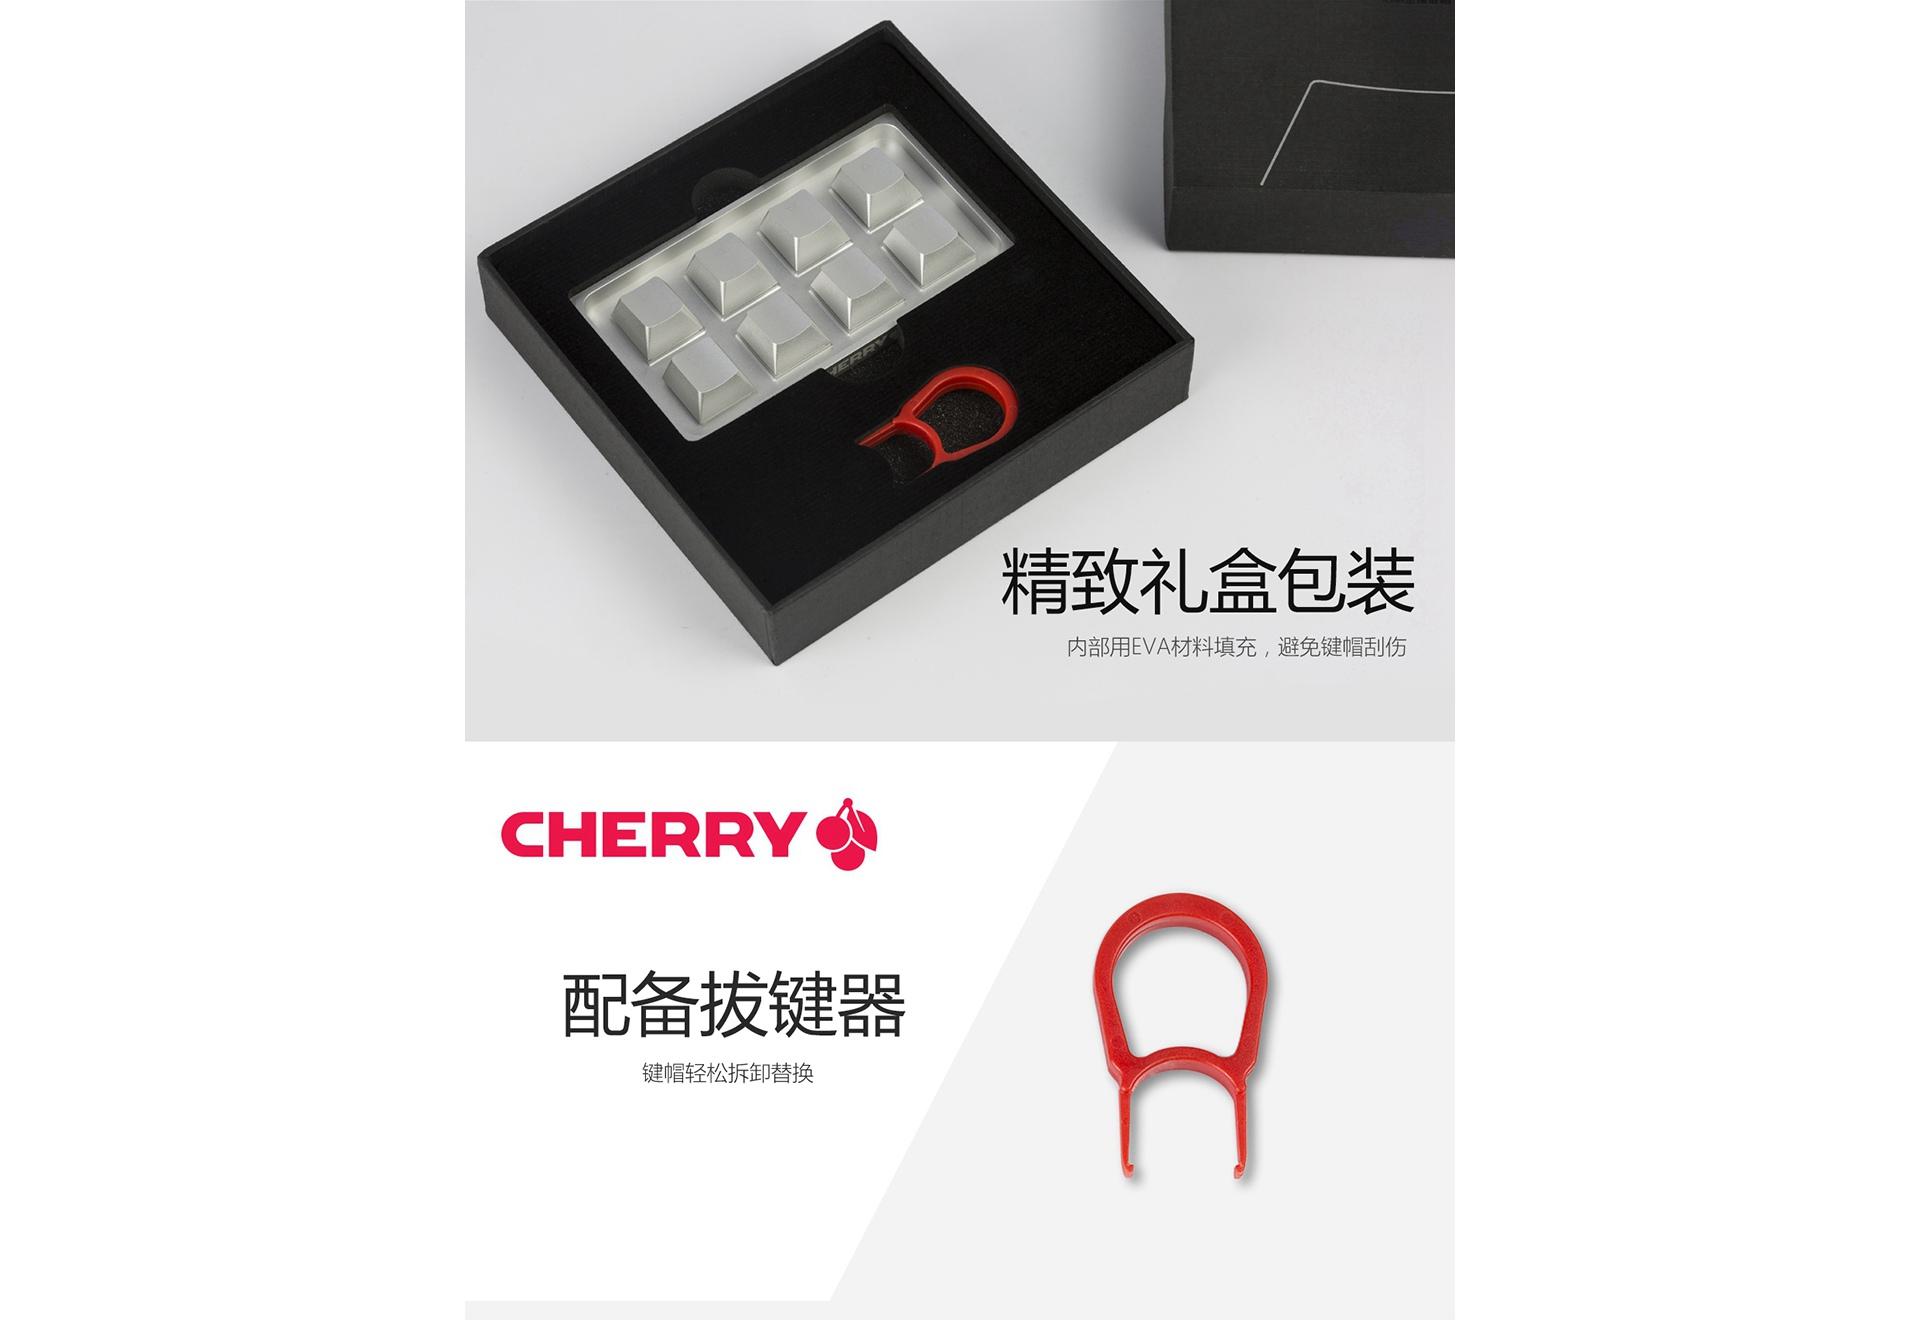 CHERRY KA026金属键帽详情页6.jpg